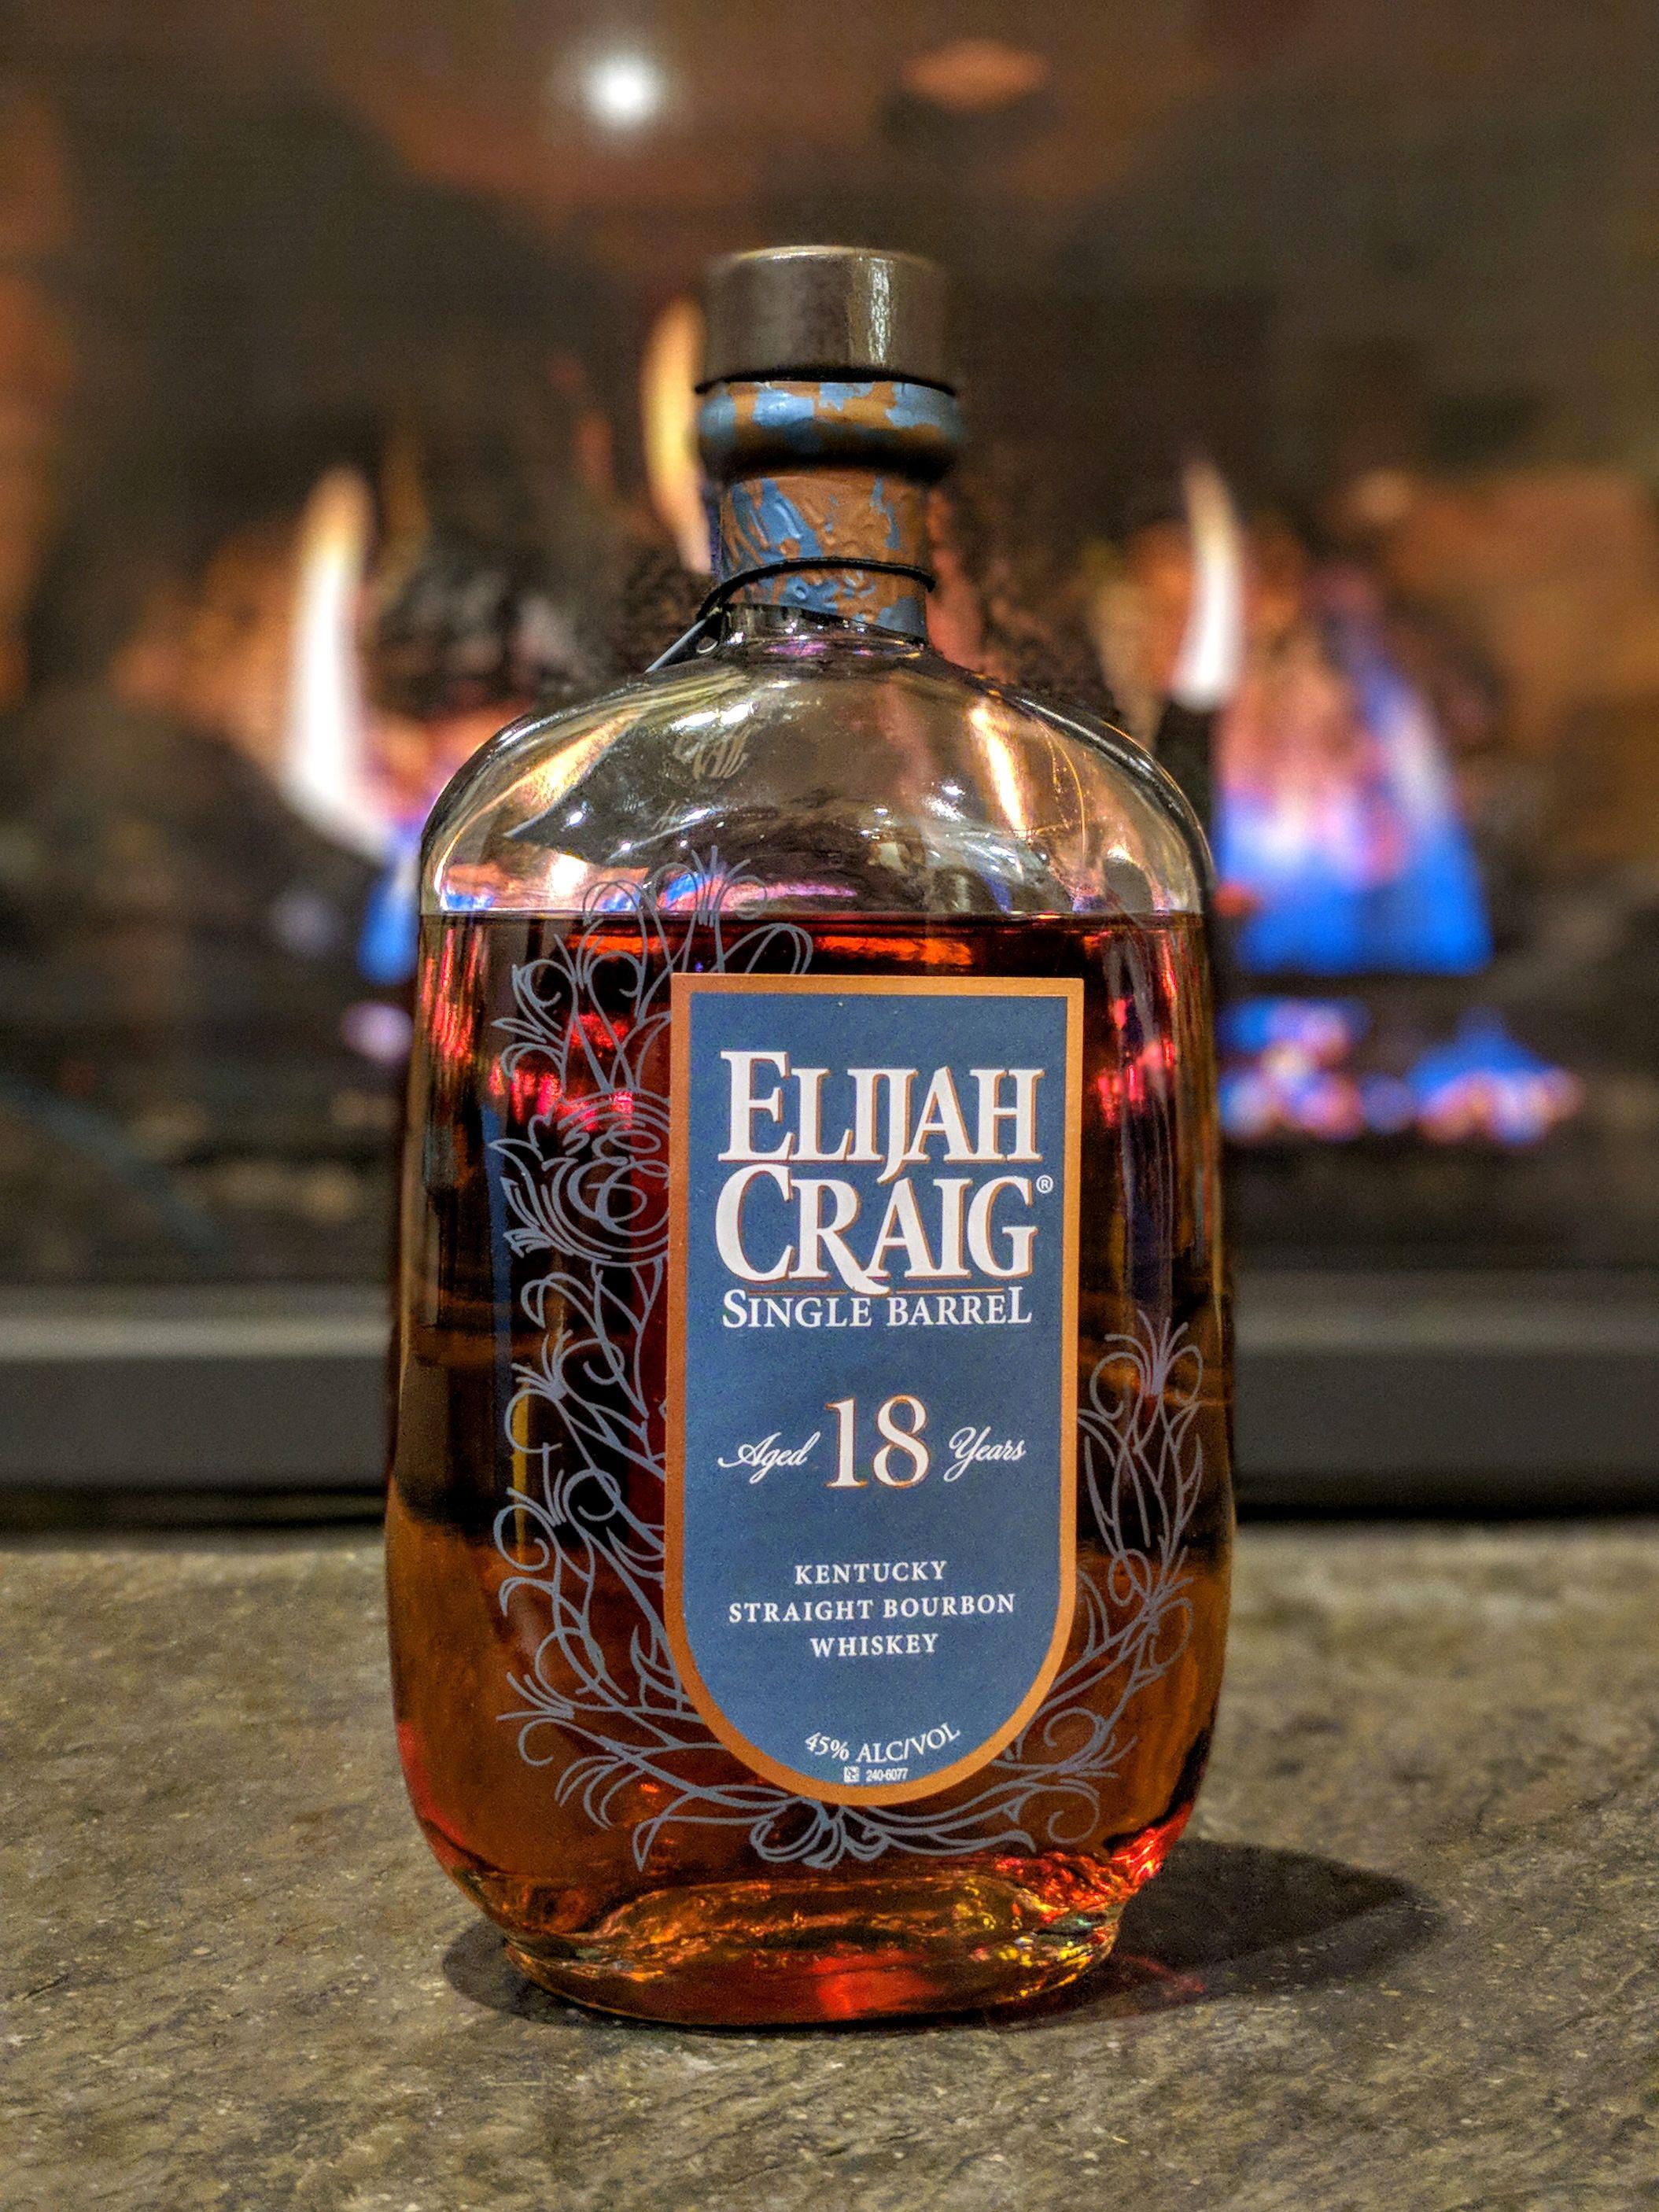 WS_Elijah_Craig_SB_18Yr.jpg